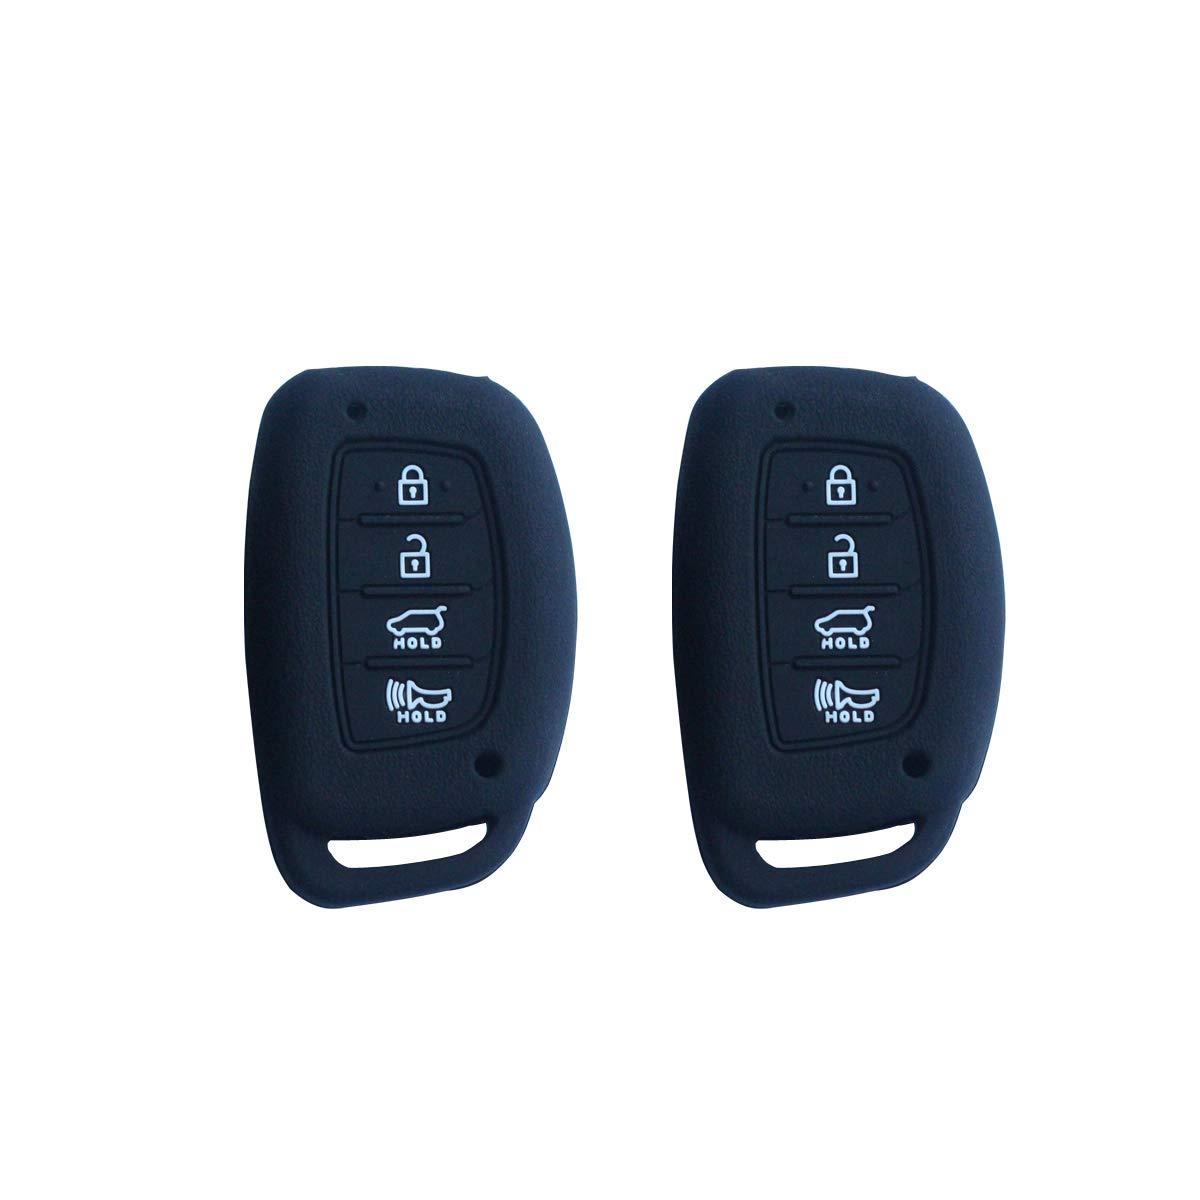 3pcs Car Remote Key Cover Fob Silicone Skin Case for Hyundai Tucson I40 IX35 I45 Elantra Rayna Sonata Smart Keys Outer Casing Shell Jacket Protector 4 Buttons